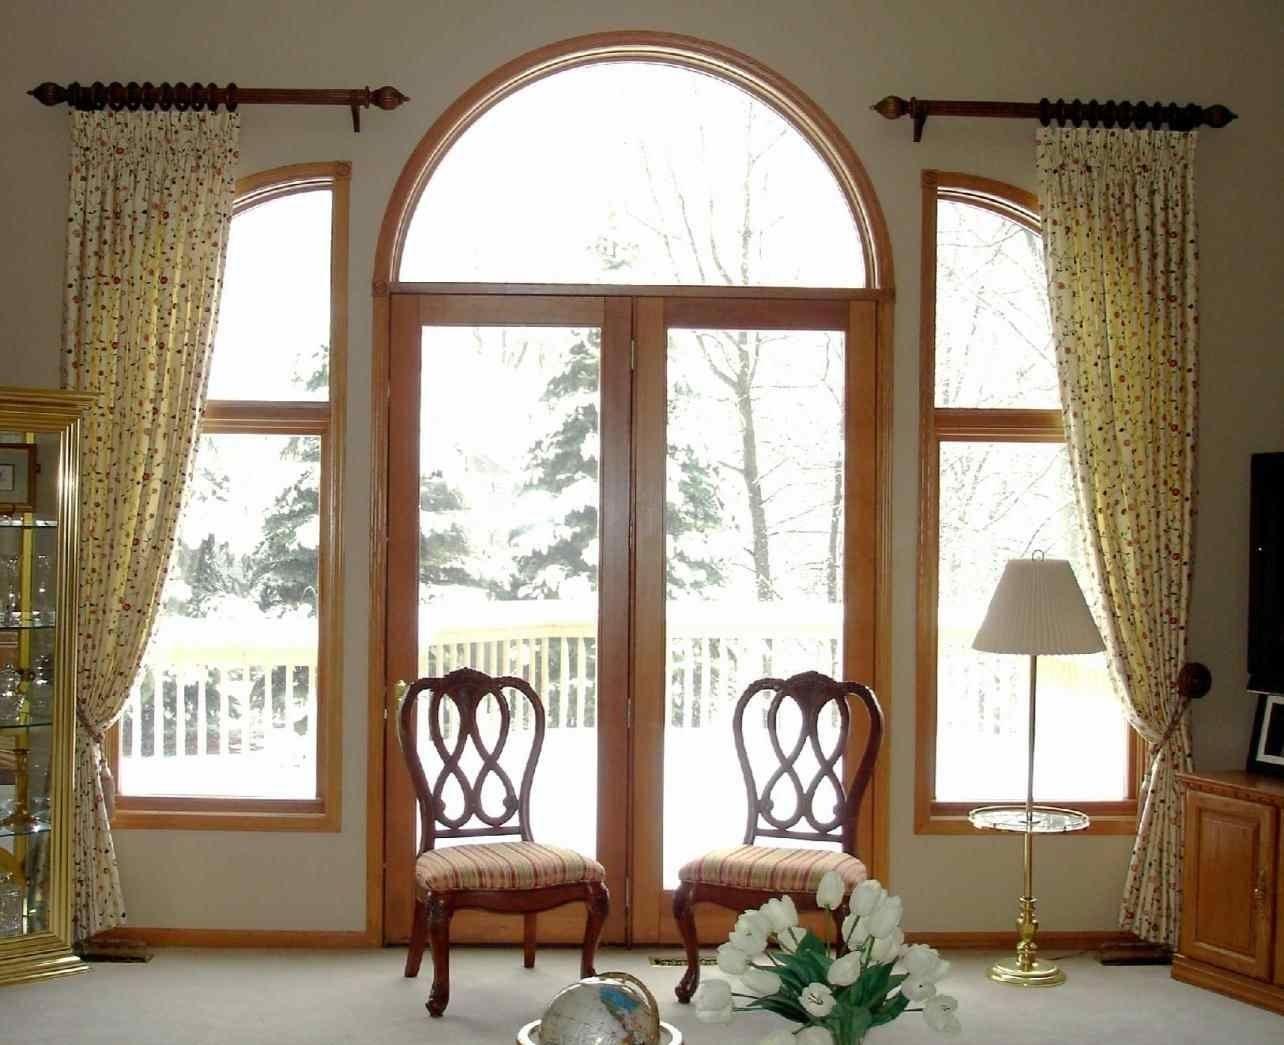 Quarter Round Window Treatments Answerplane Com Arched Window Treatments Arched Entry Doors Front Doors With Windows